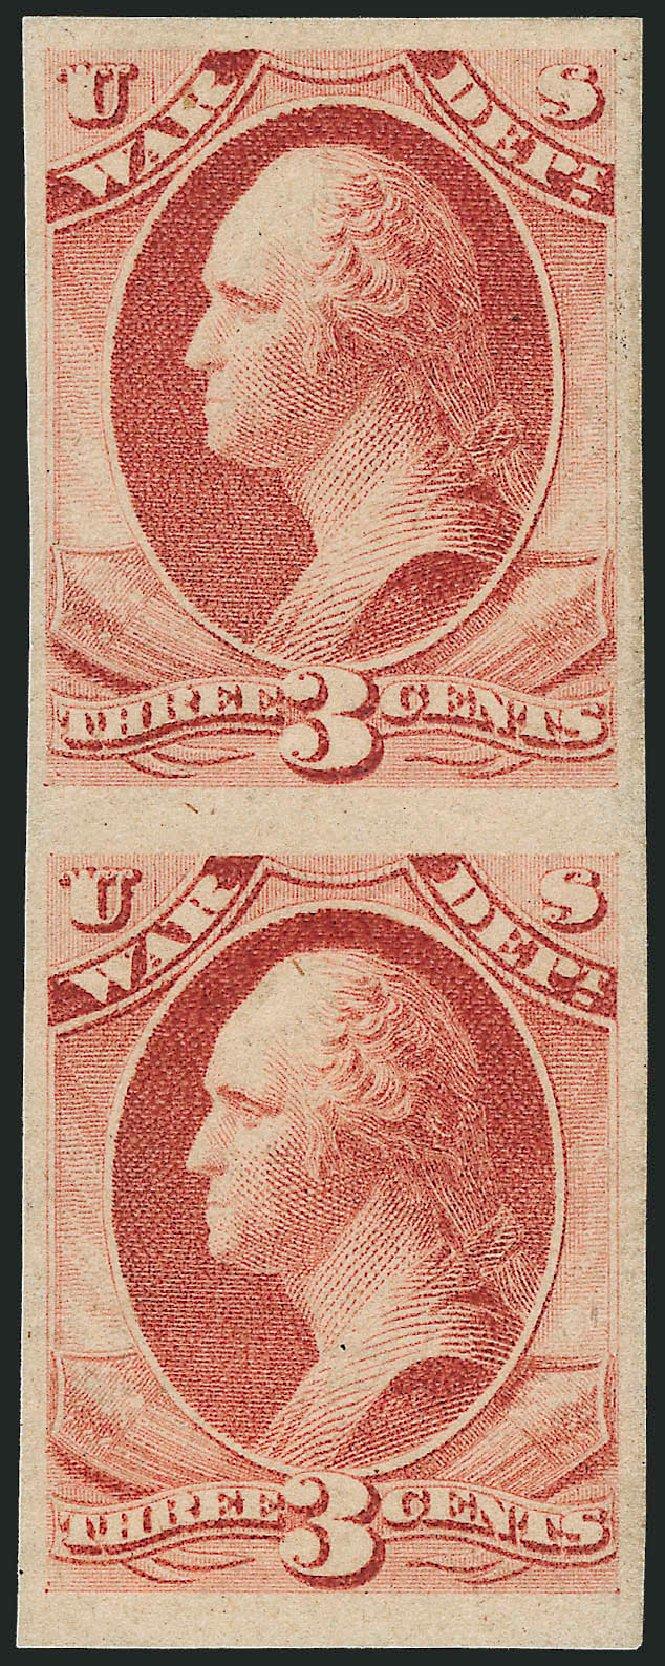 US Stamp Values Scott Catalogue #O116: 3c 1879 War Official. Robert Siegel Auction Galleries, Dec 2010, Sale 1003, Lot 5452